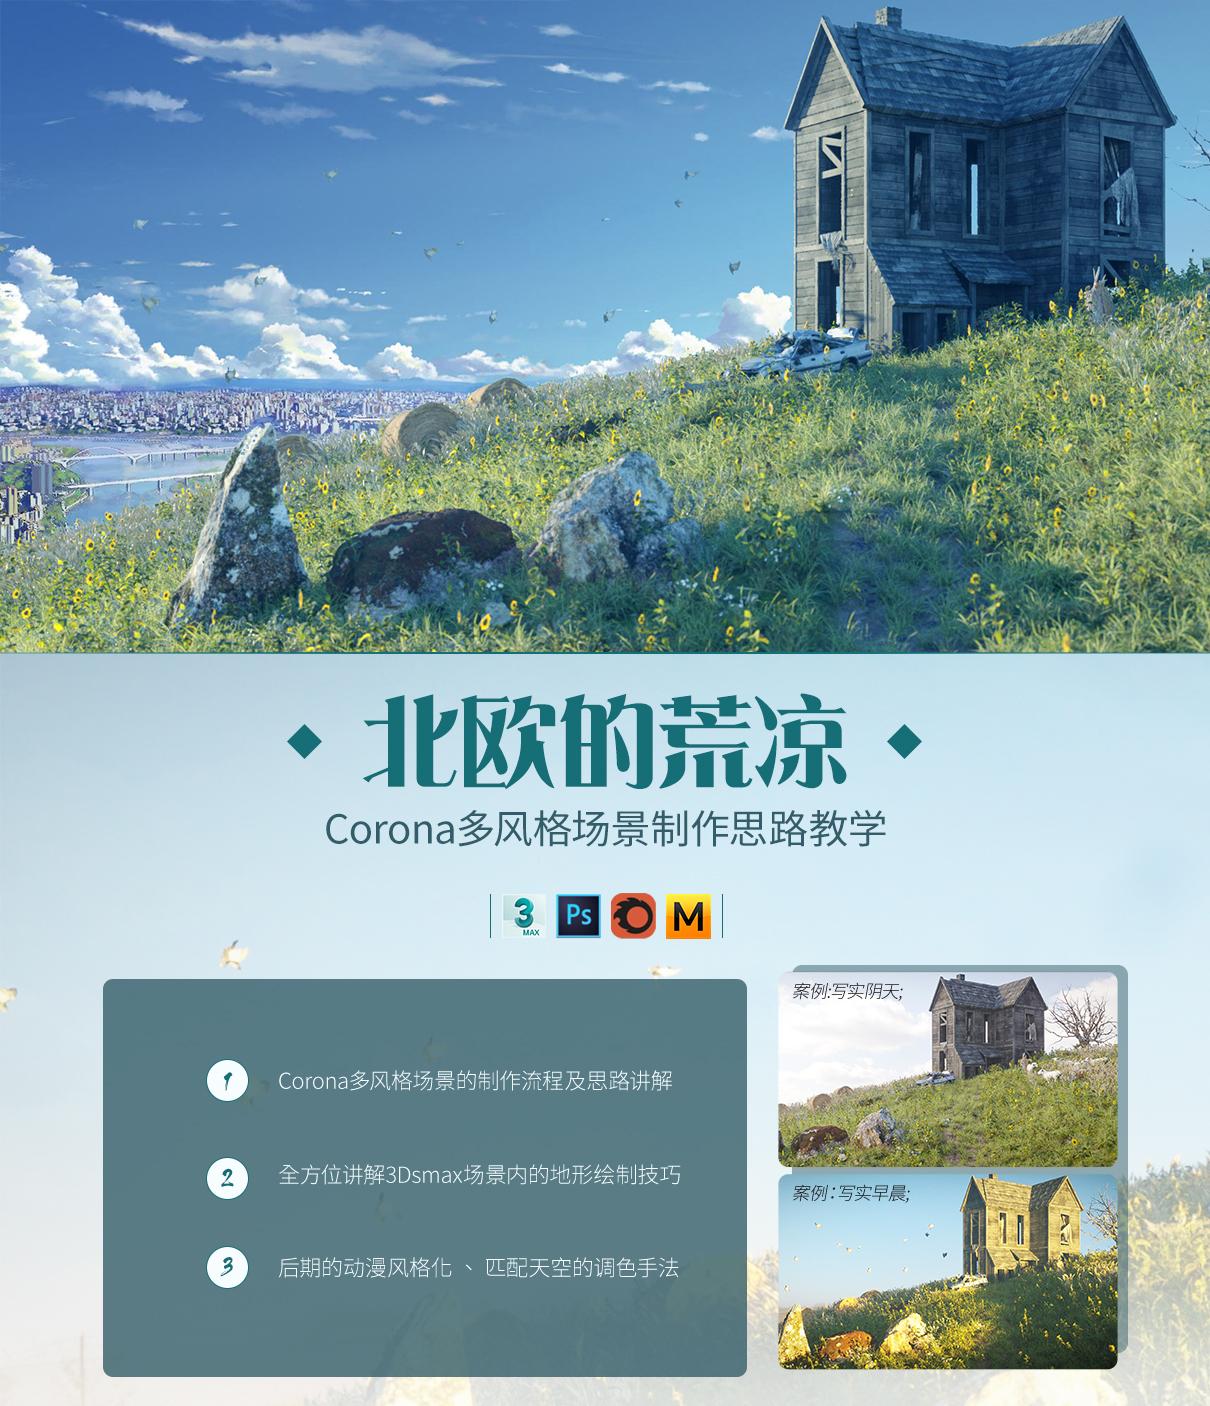 Corona影视场景《北欧的荒凉》多风格场景渲染思路教学